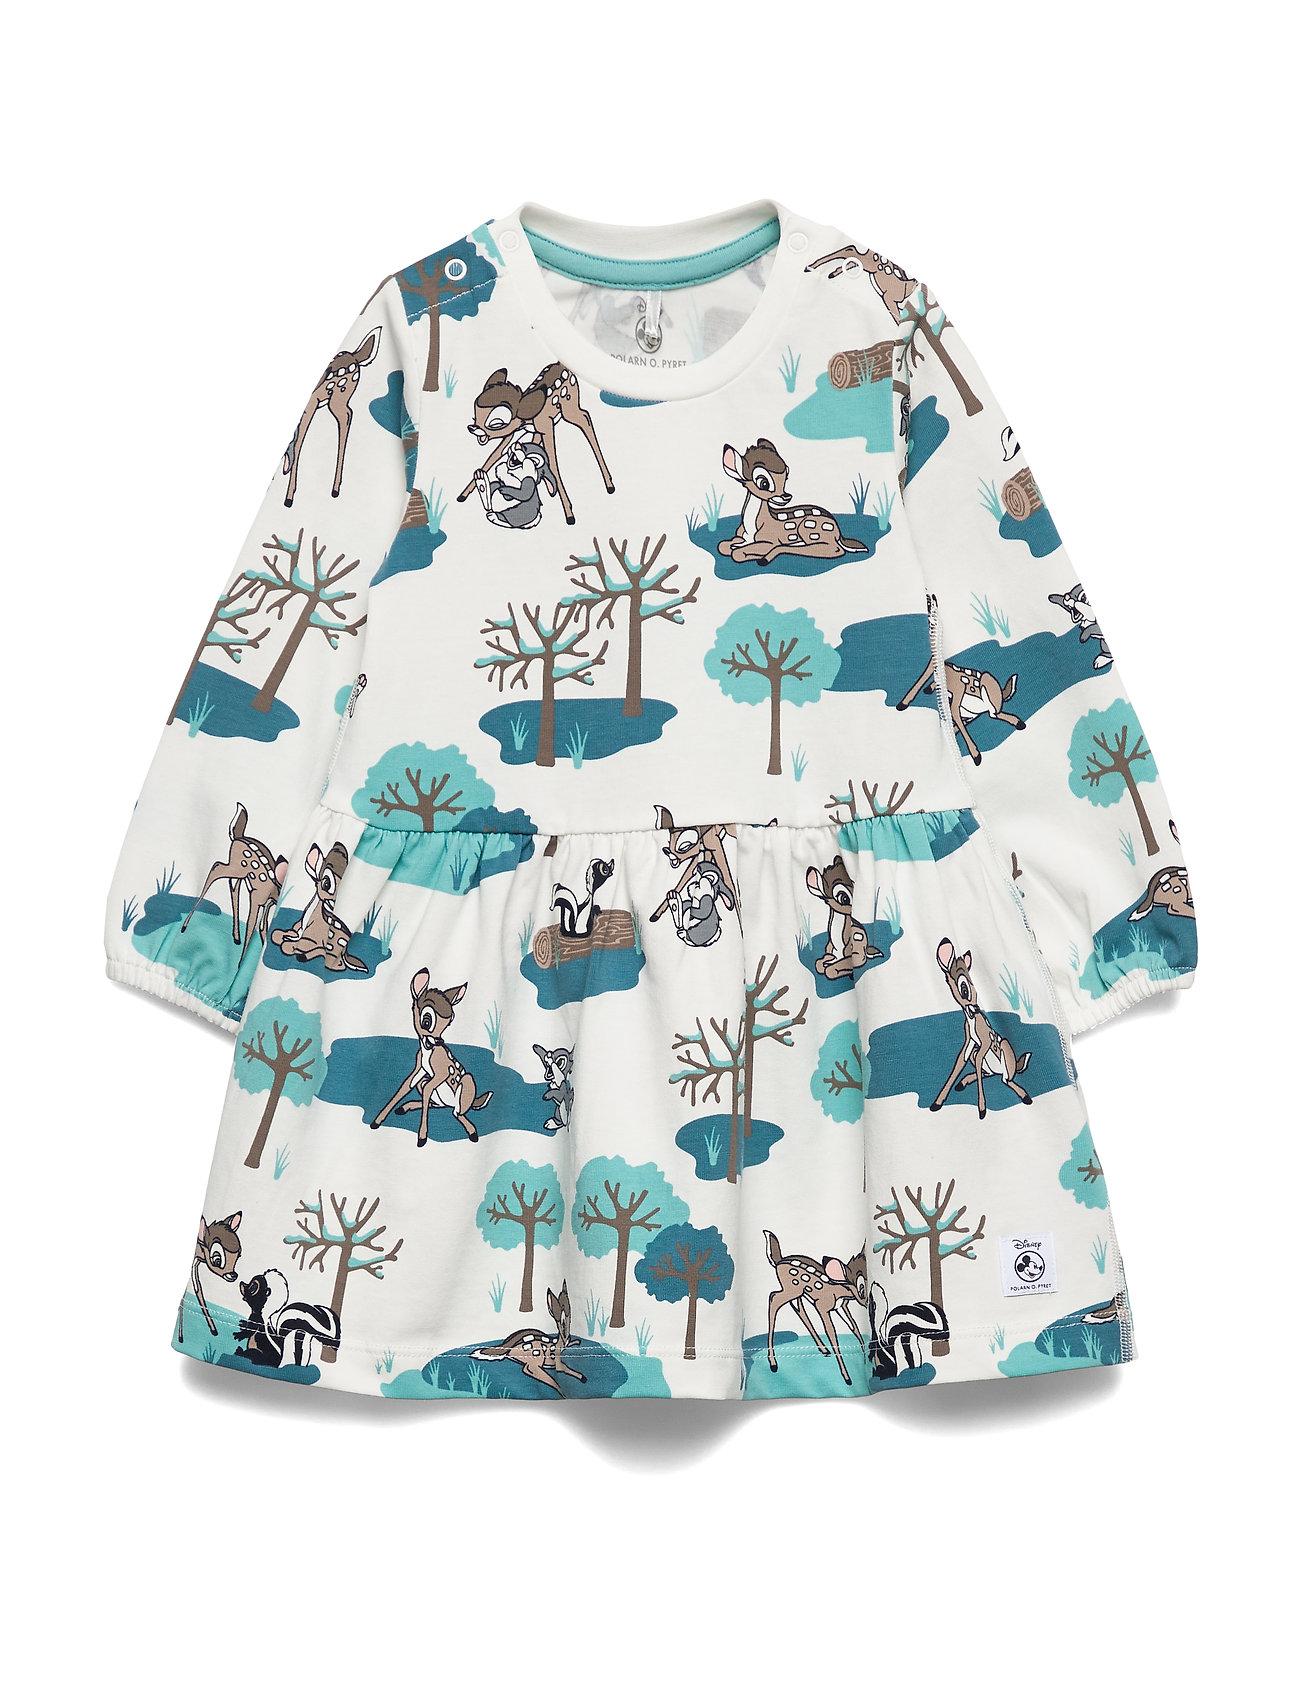 Polarn O. Pyret Disney Collection Dress L/S Baby - MARINE BLUE